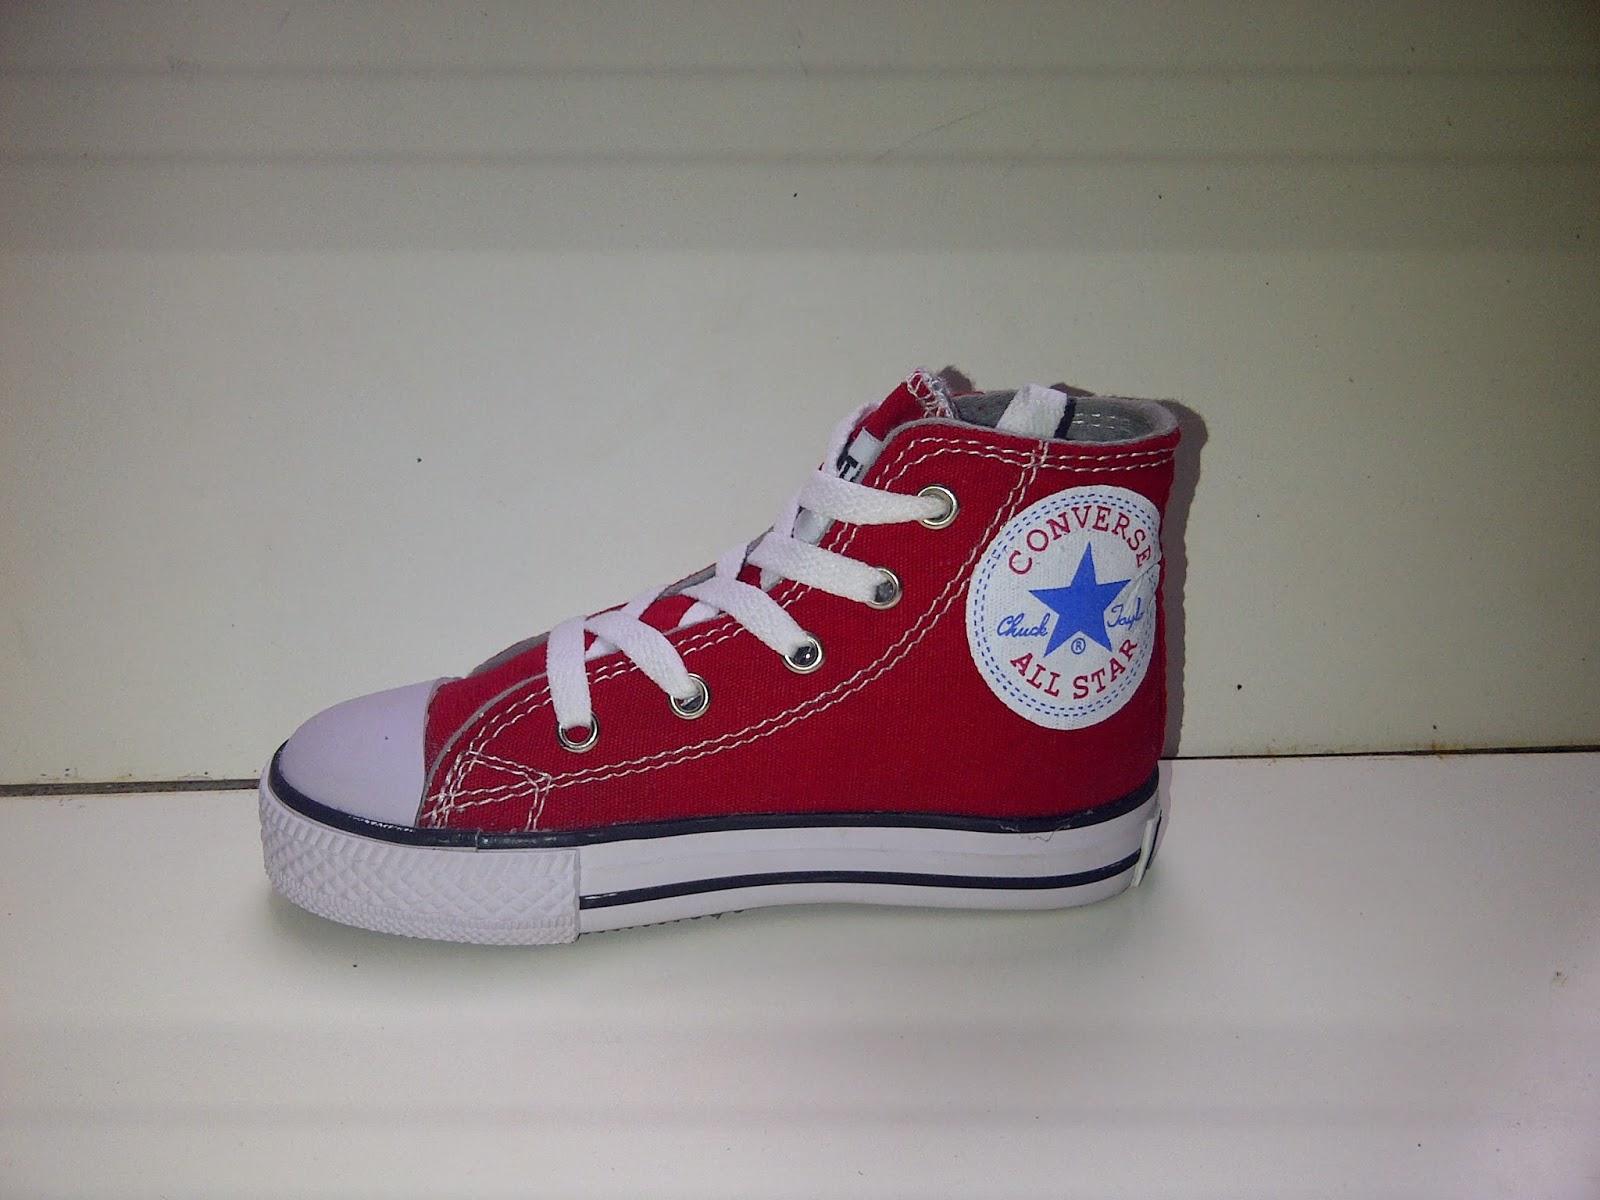 sepatu anak,sepatu anak SD,sepatu anak murah